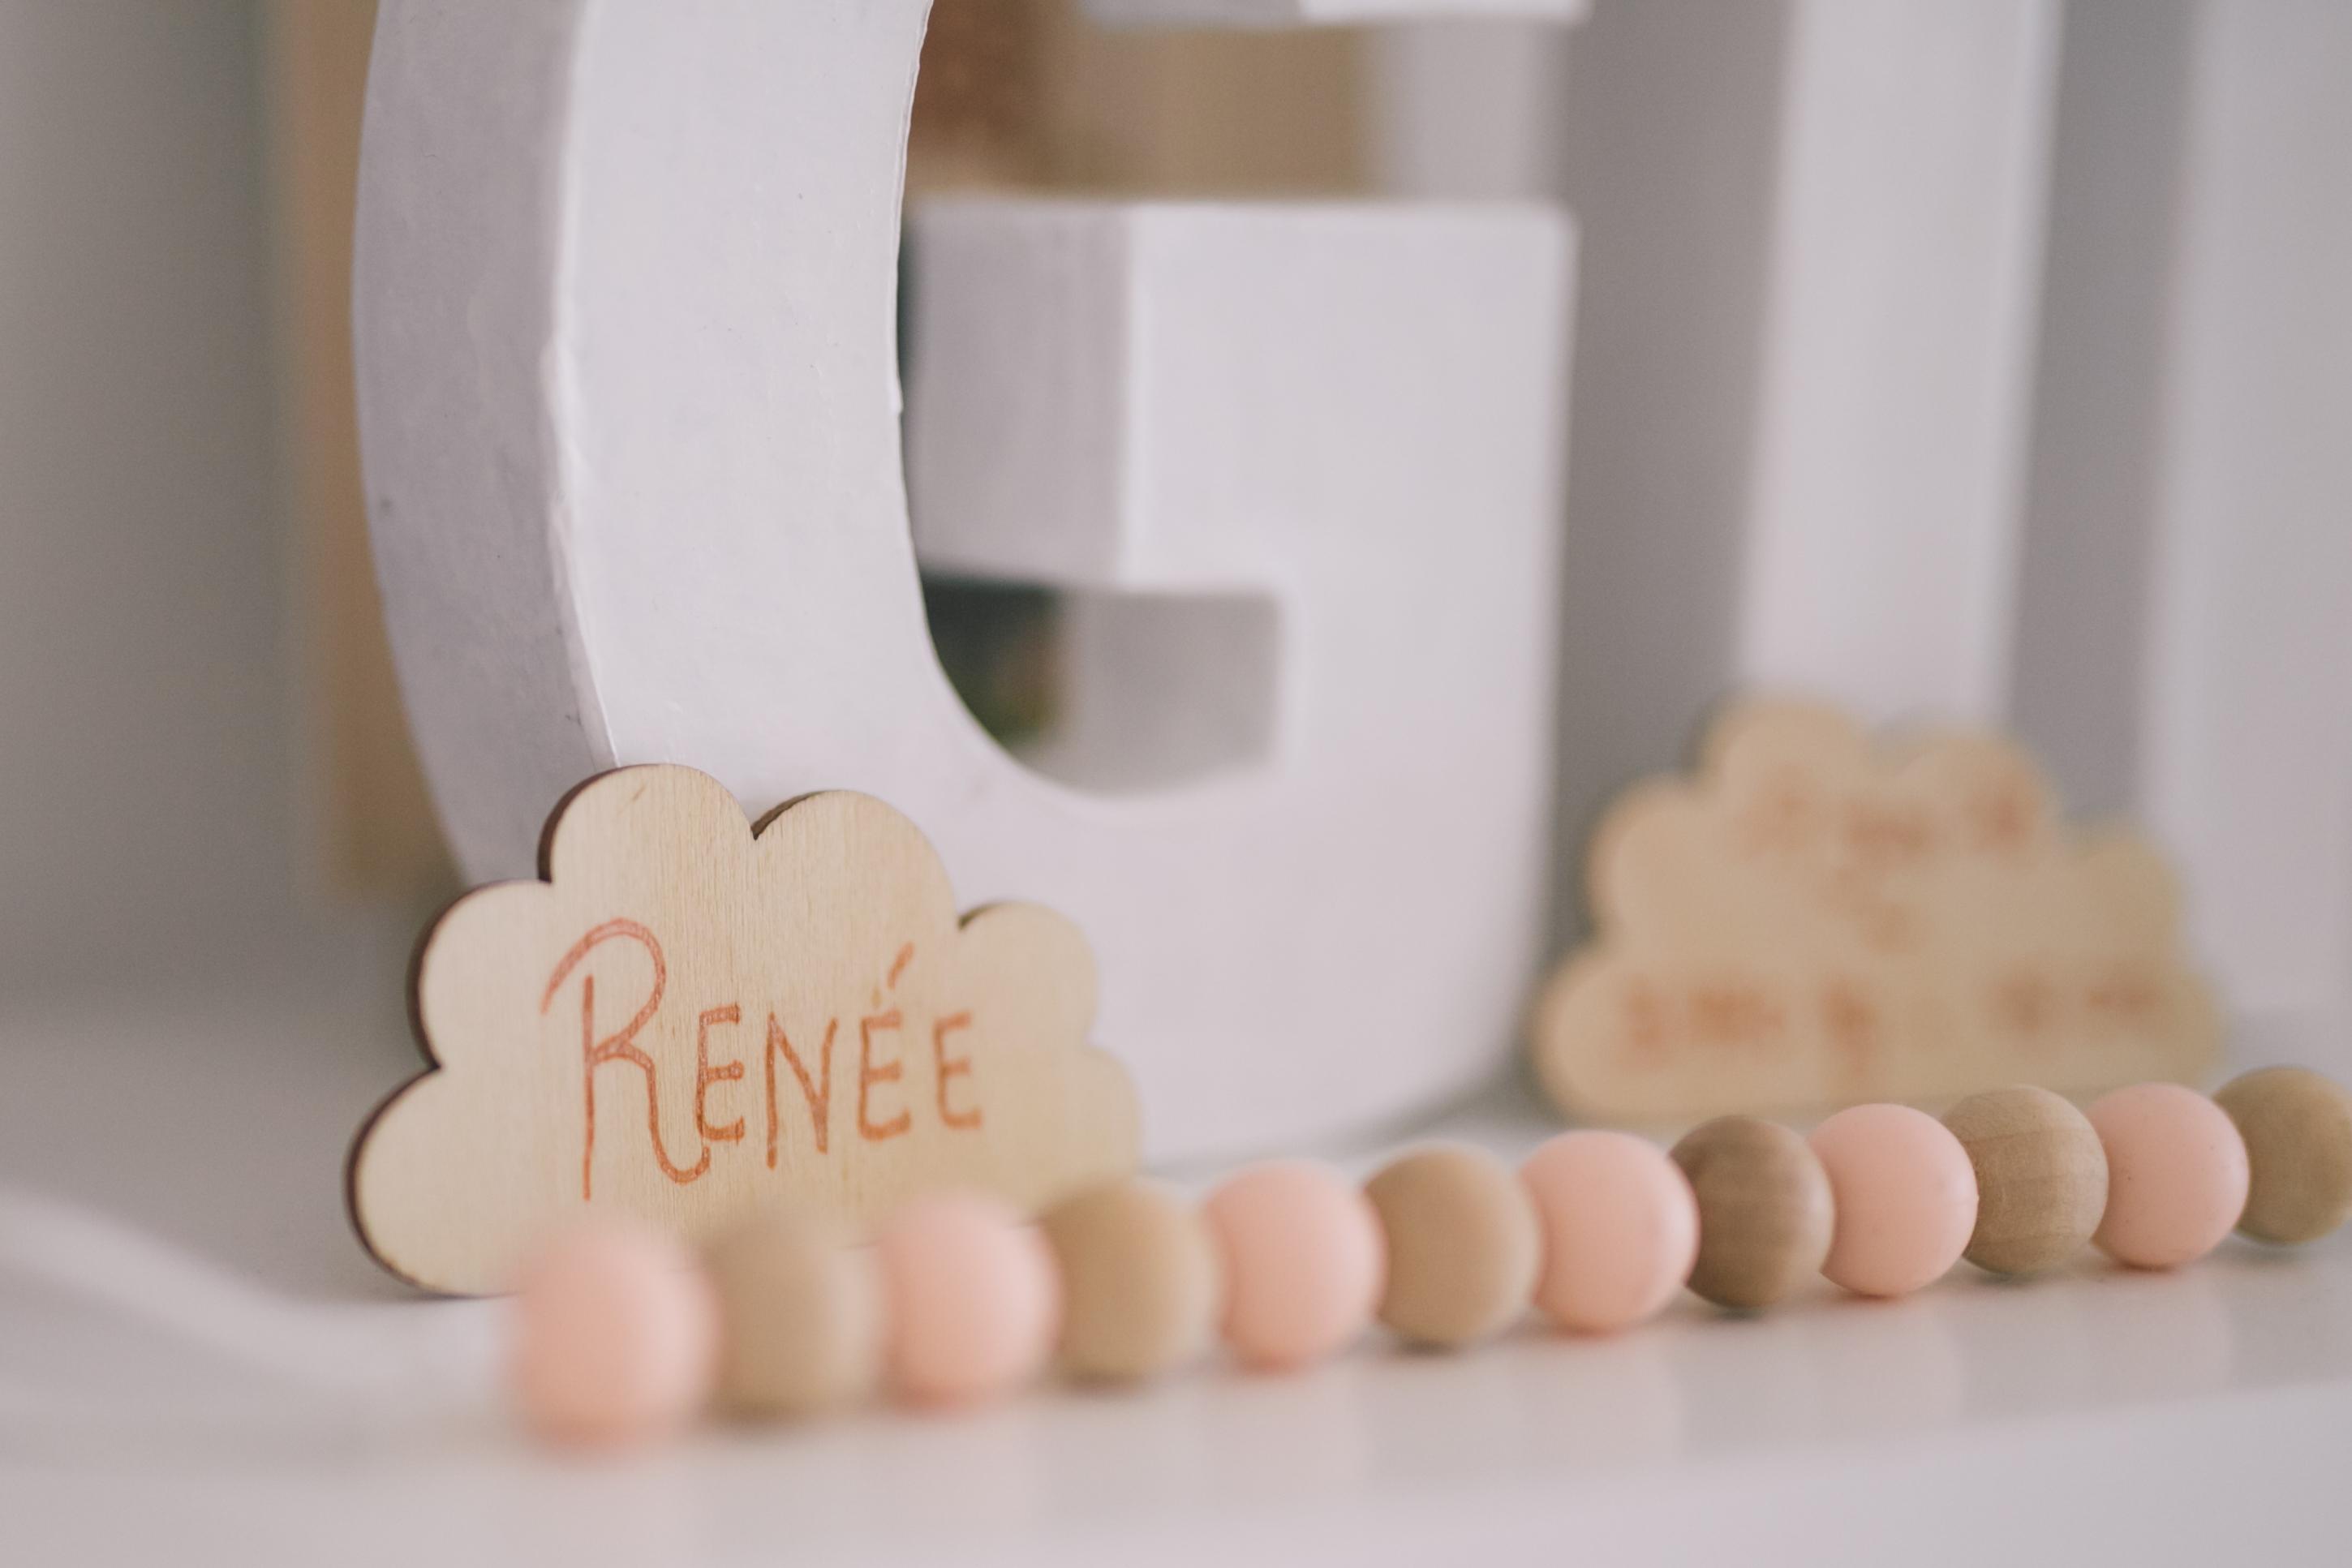 RENEE-2